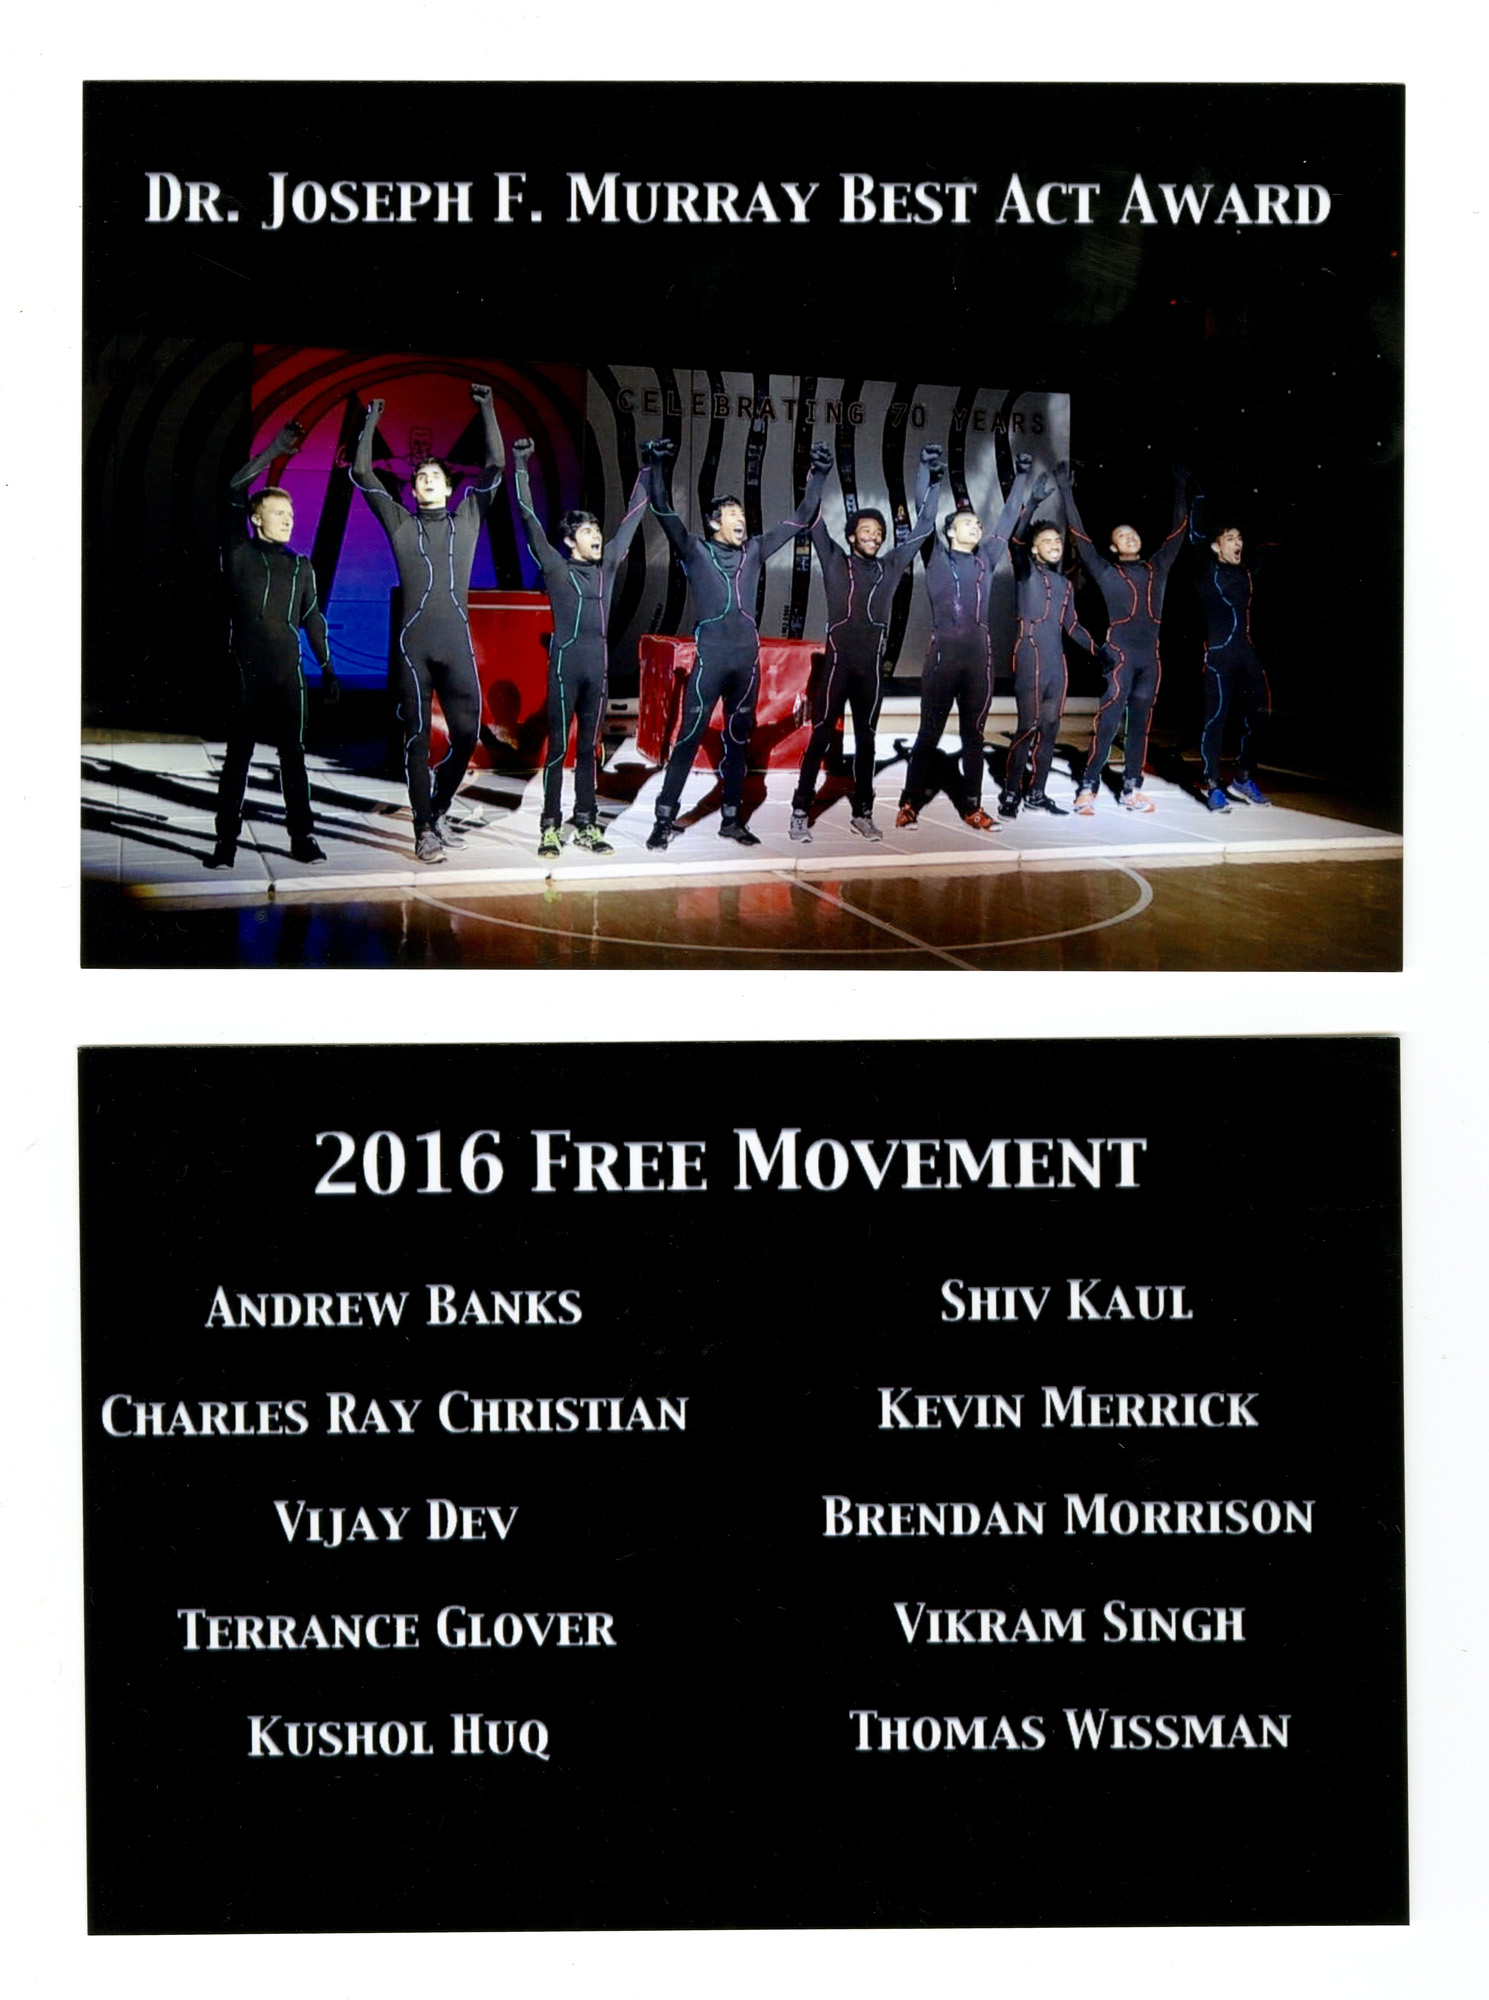 2016 - Free Movement